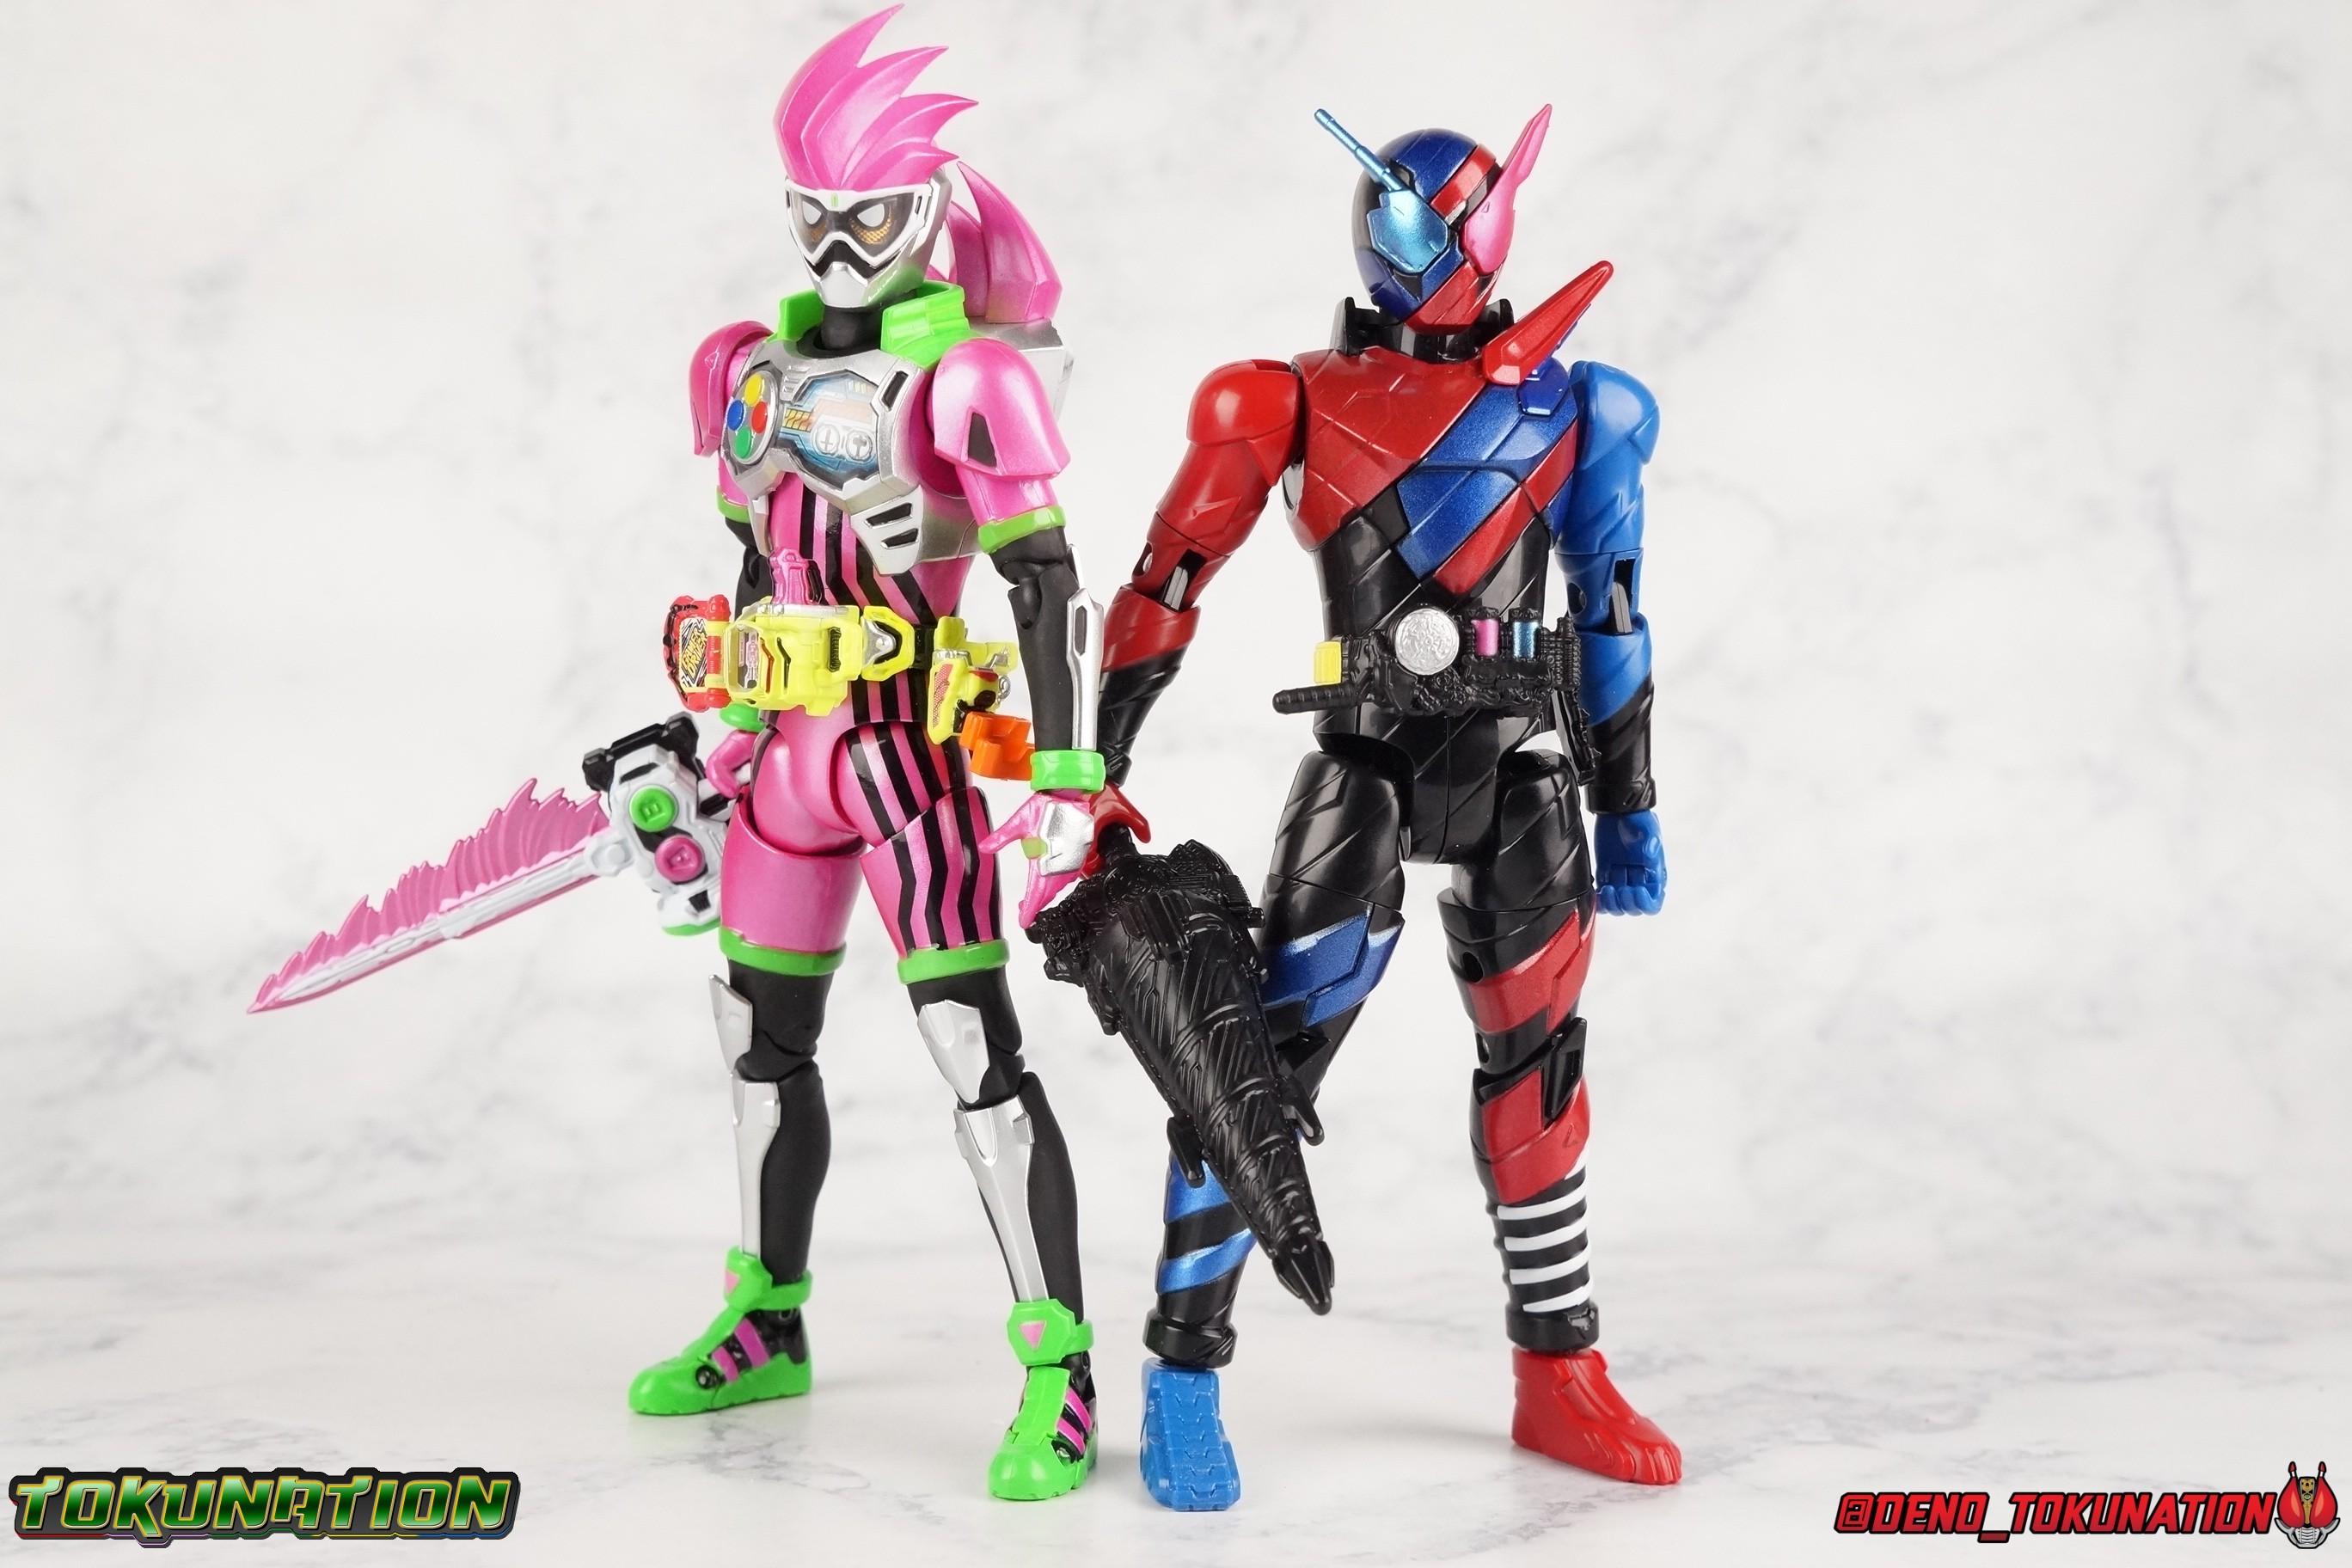 Kamen Rider Black Rx Episode 1 Kissasian